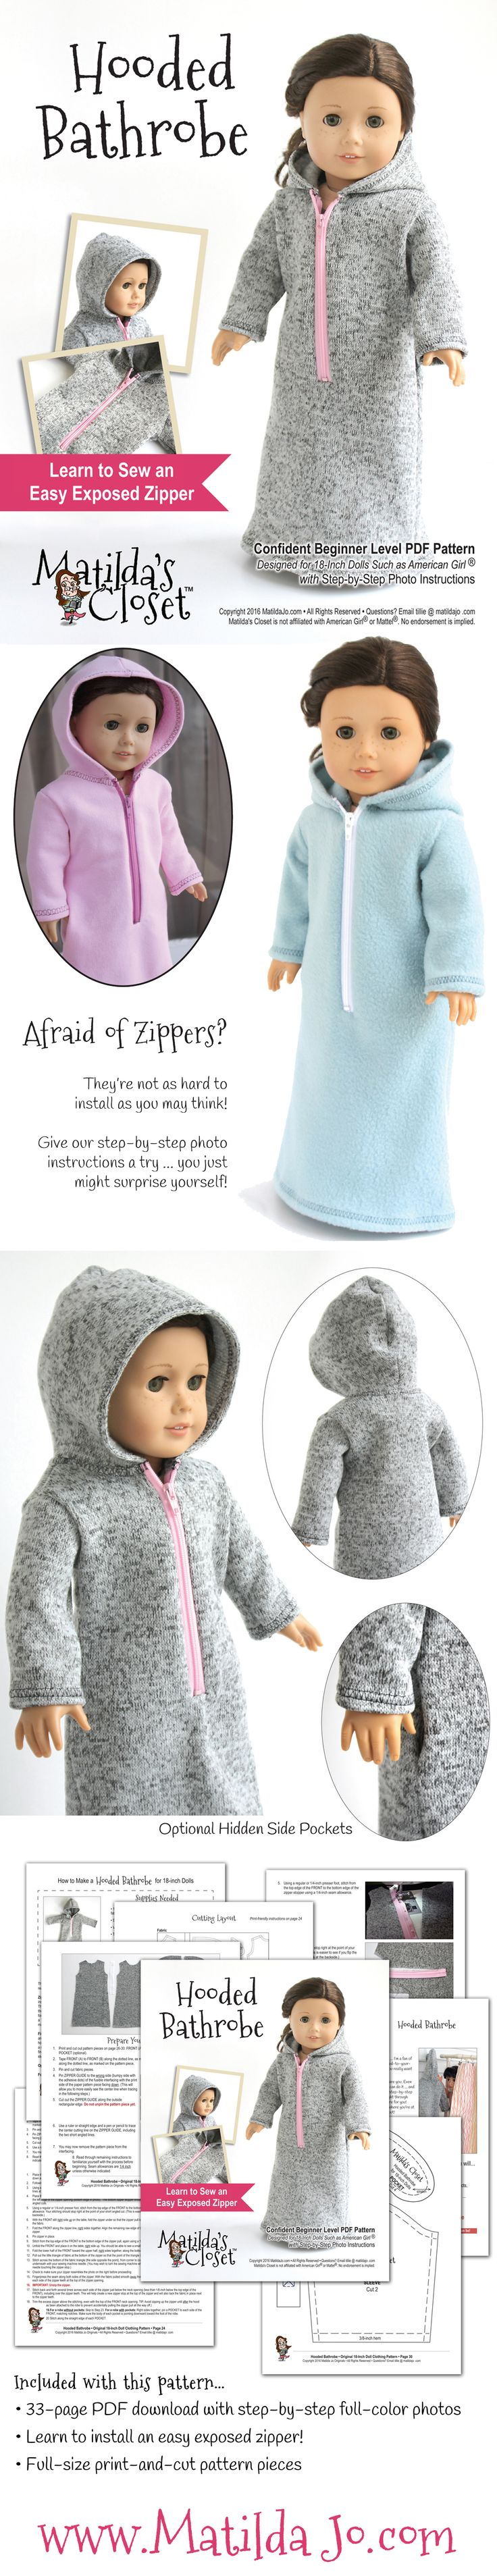 Sew an easy hooded bathrobe for your 18-inch doll! Pattern by Matilda's Closet ... Matilda Jo Originals